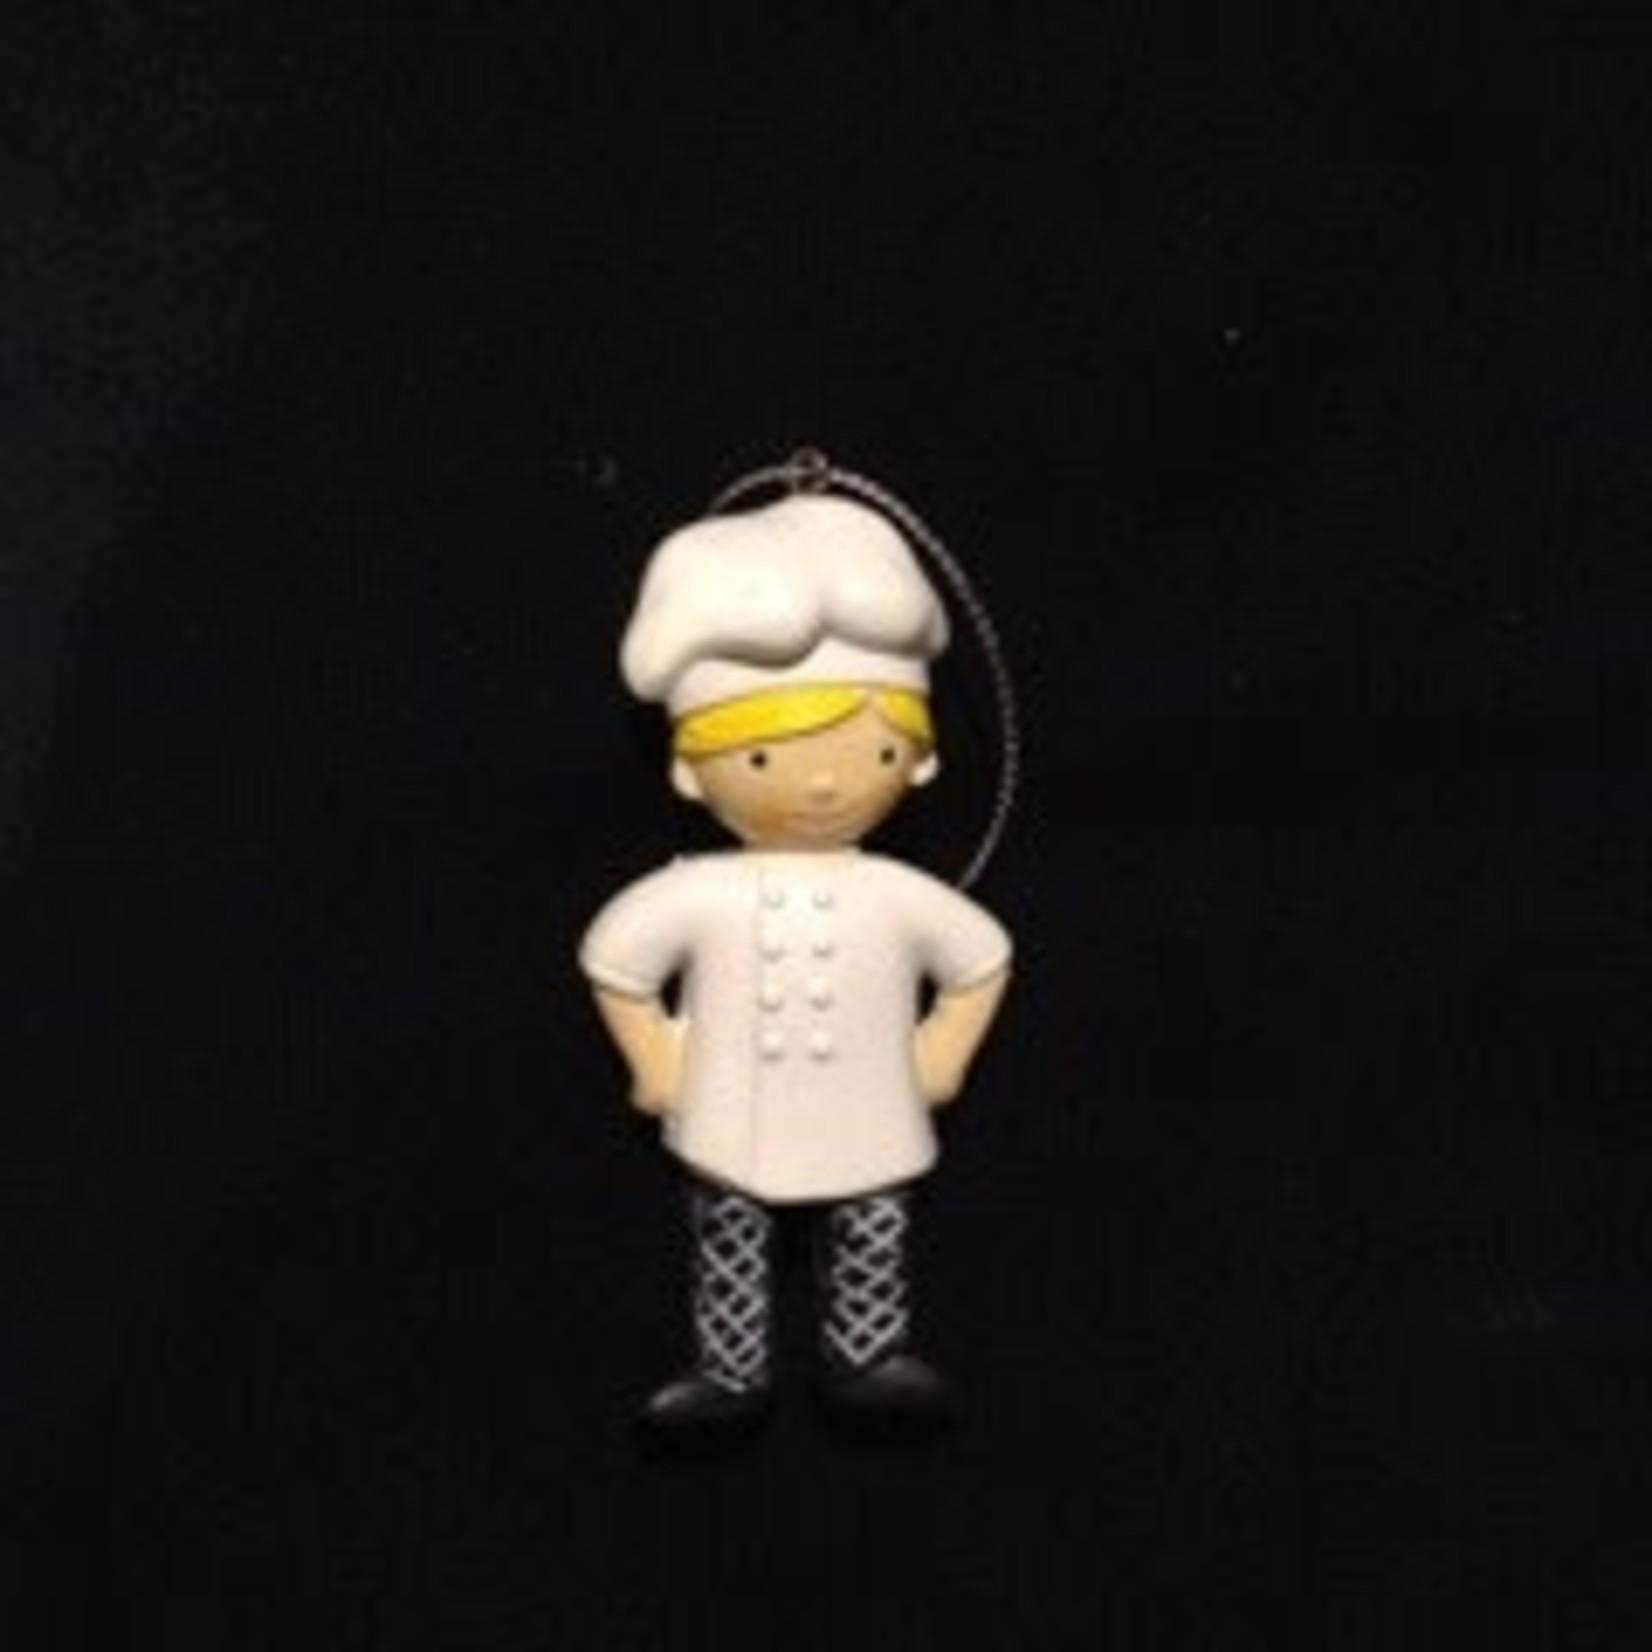 Chef - Blonde Orn